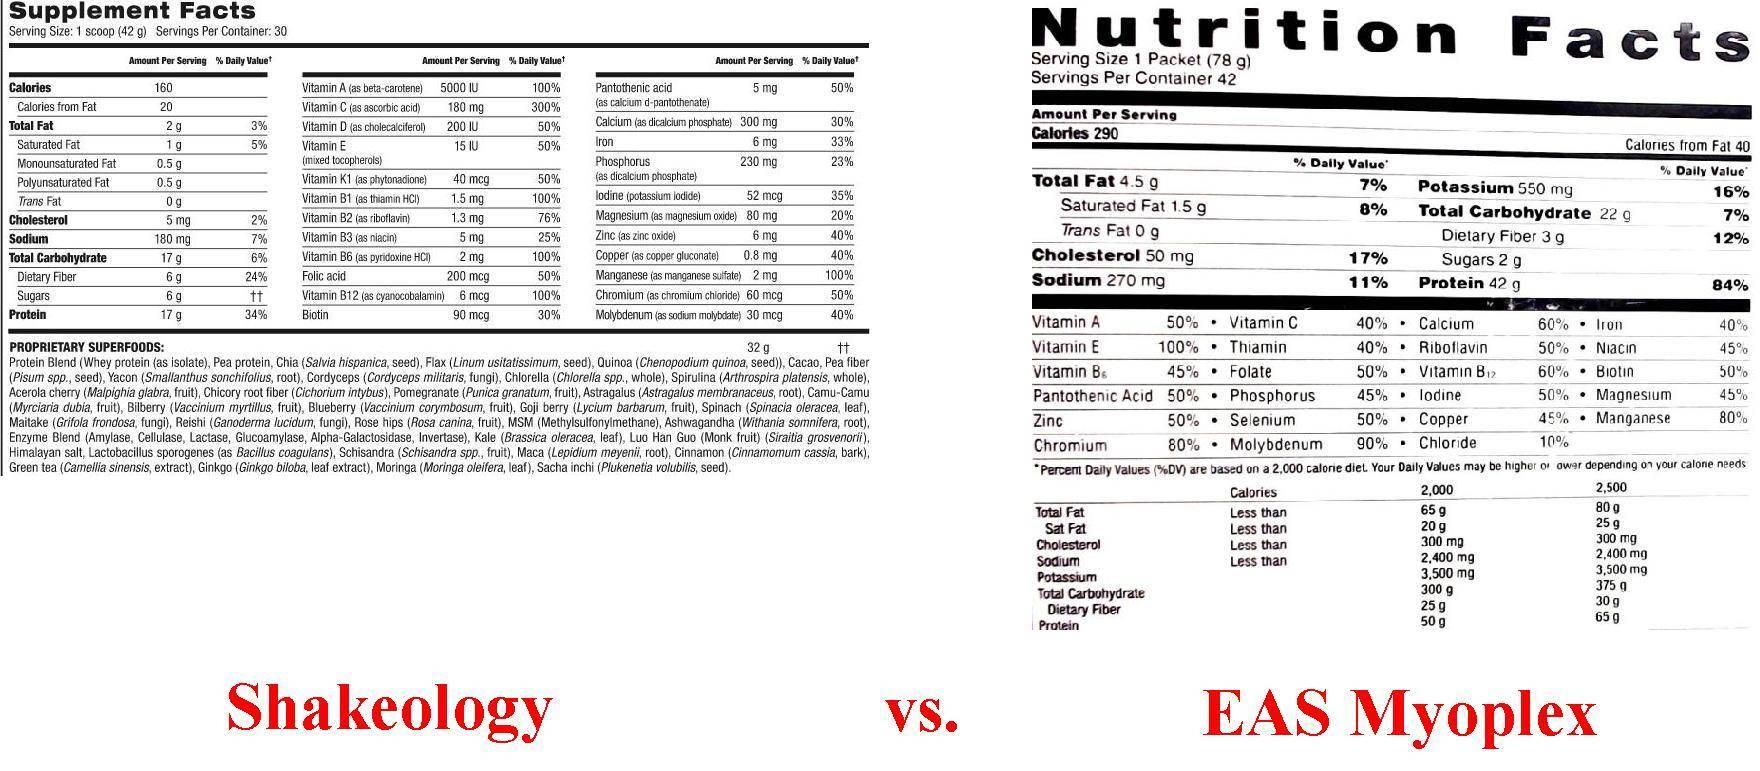 Shakeology vs EAS Myoplex